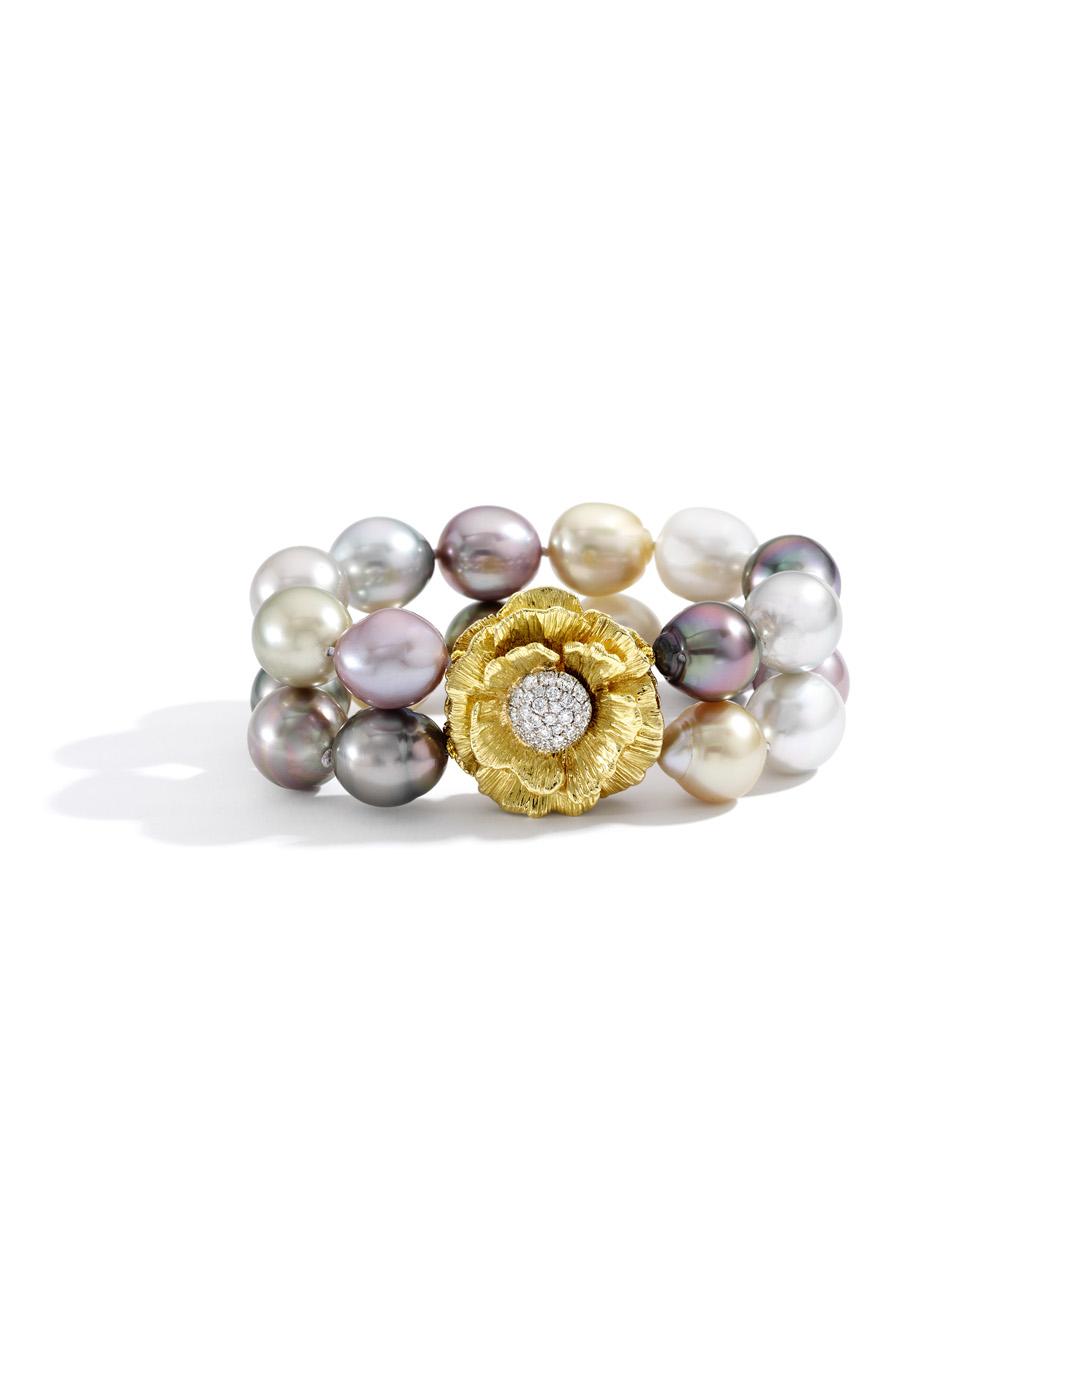 mish_jewelry_product_Poppy-Clasp-BR-1